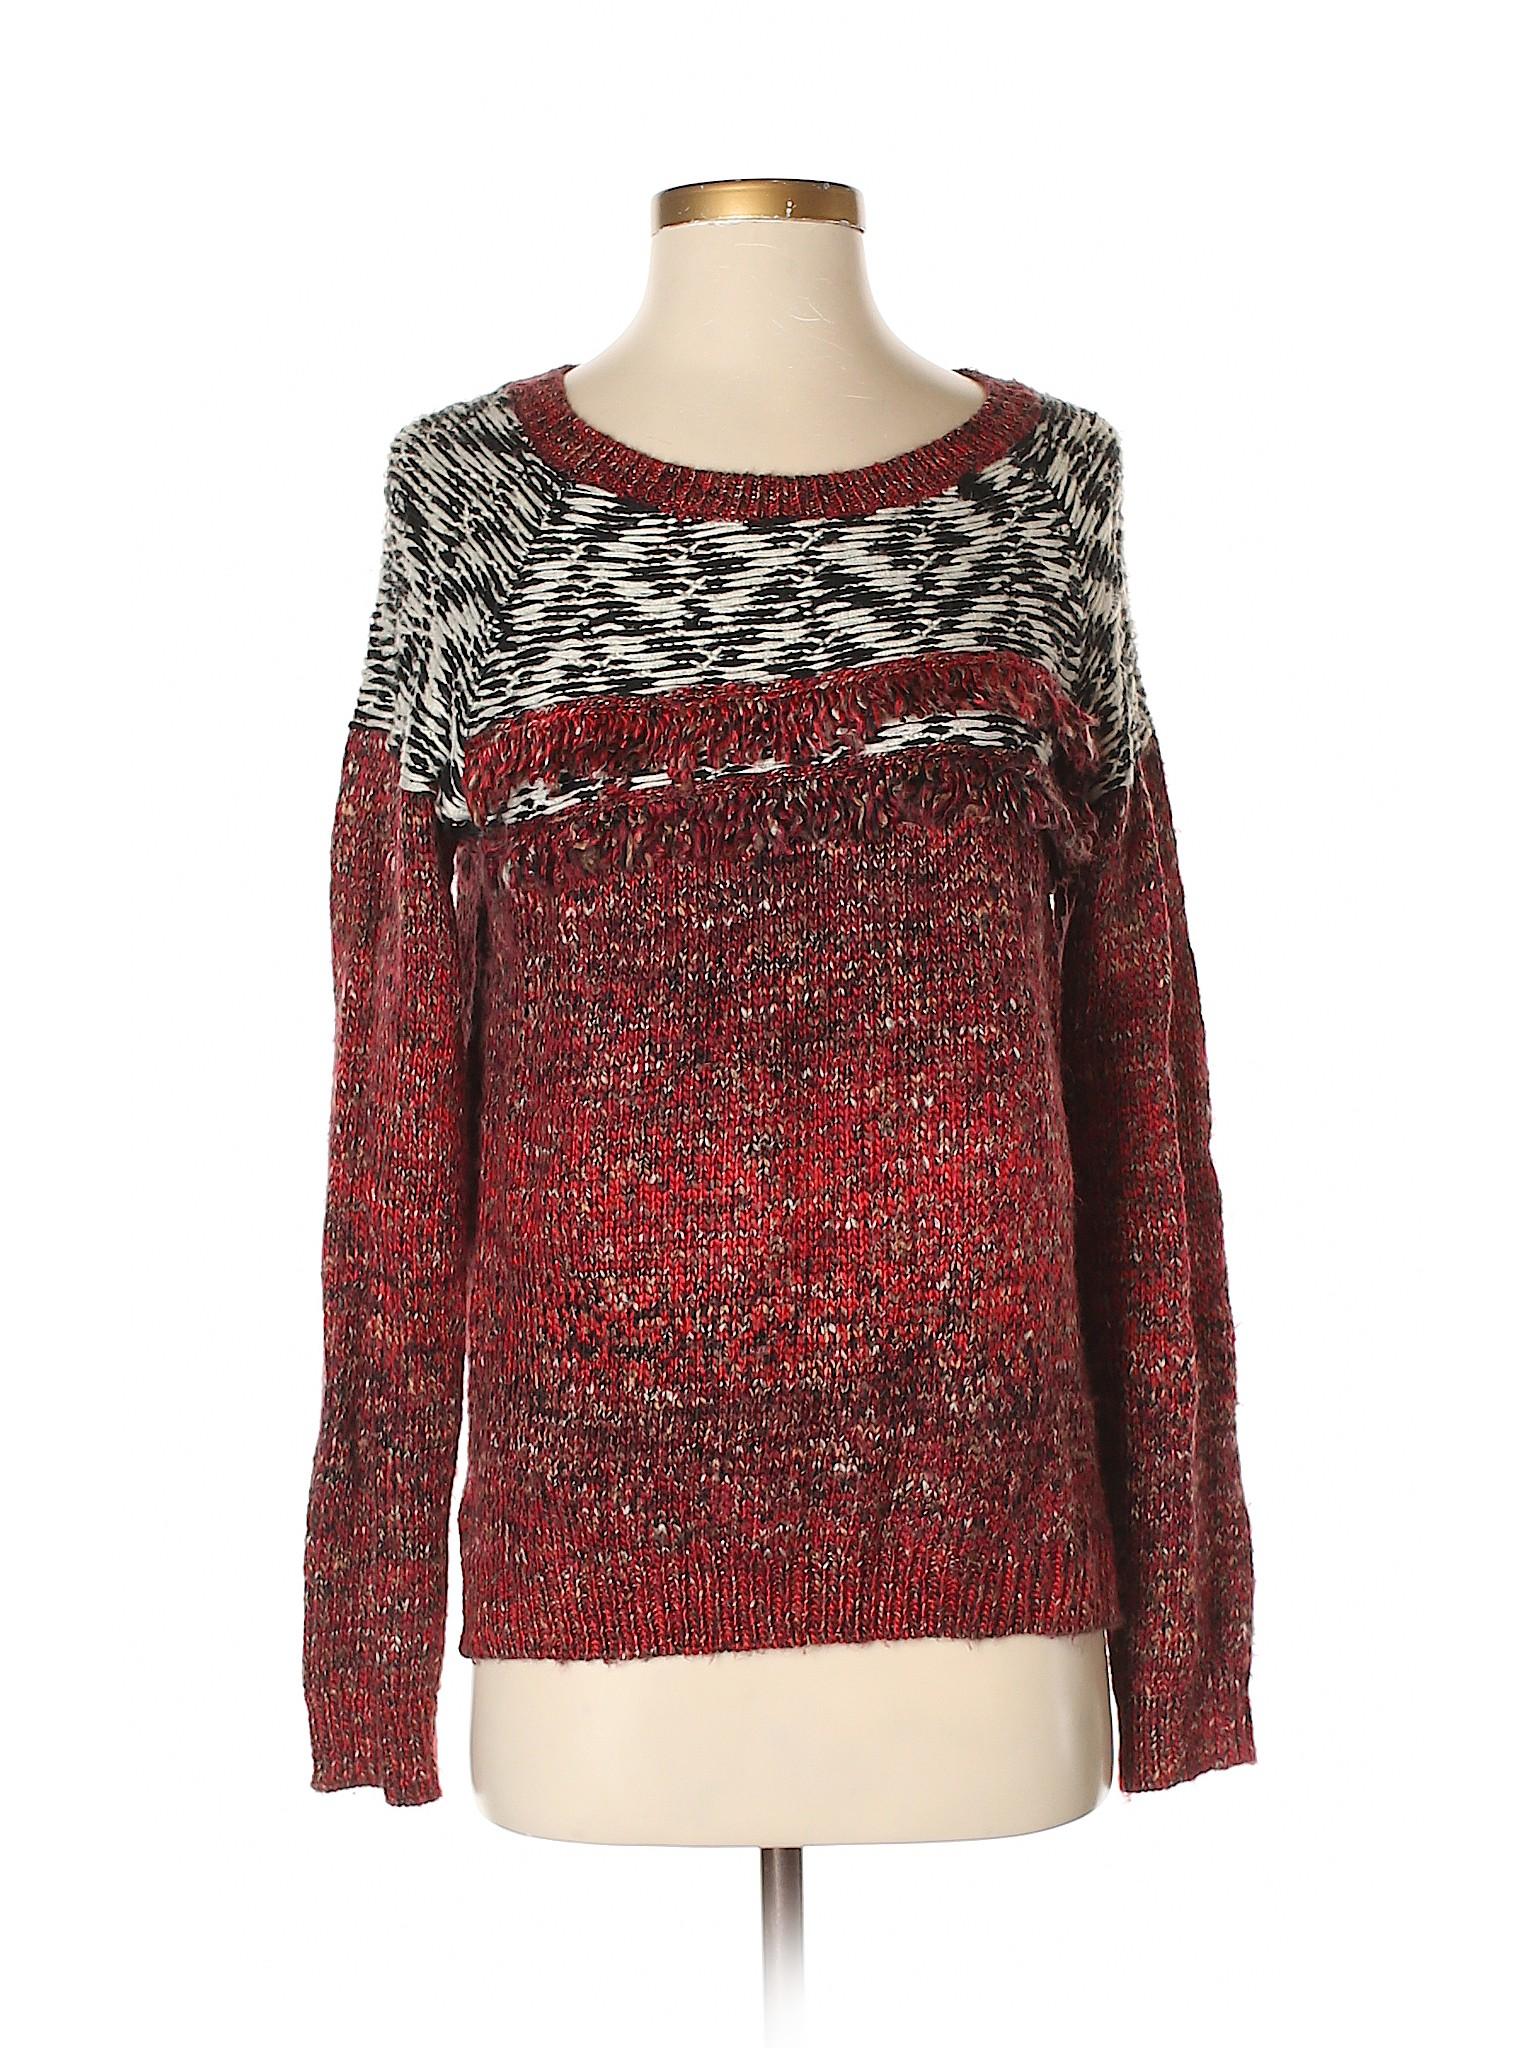 Sweater Sweater Sanctuary Pullover Boutique Boutique Sanctuary Sanctuary Boutique Pullover 87qdUaw7